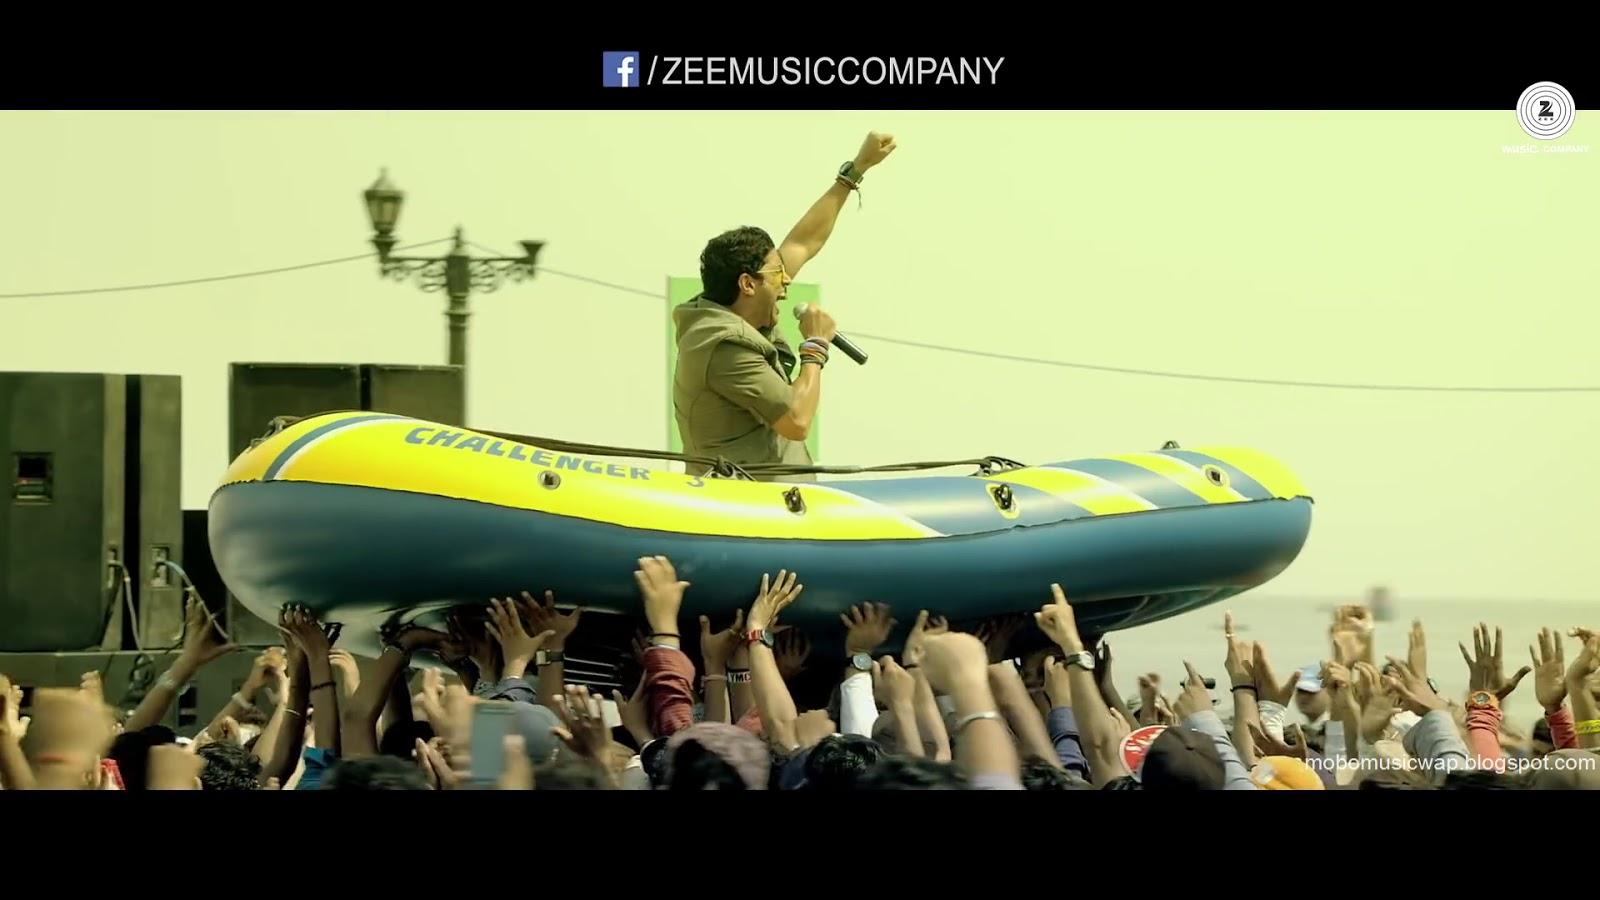 Rock on 2 revisited full hd video song farhan akhtar, shraddha.